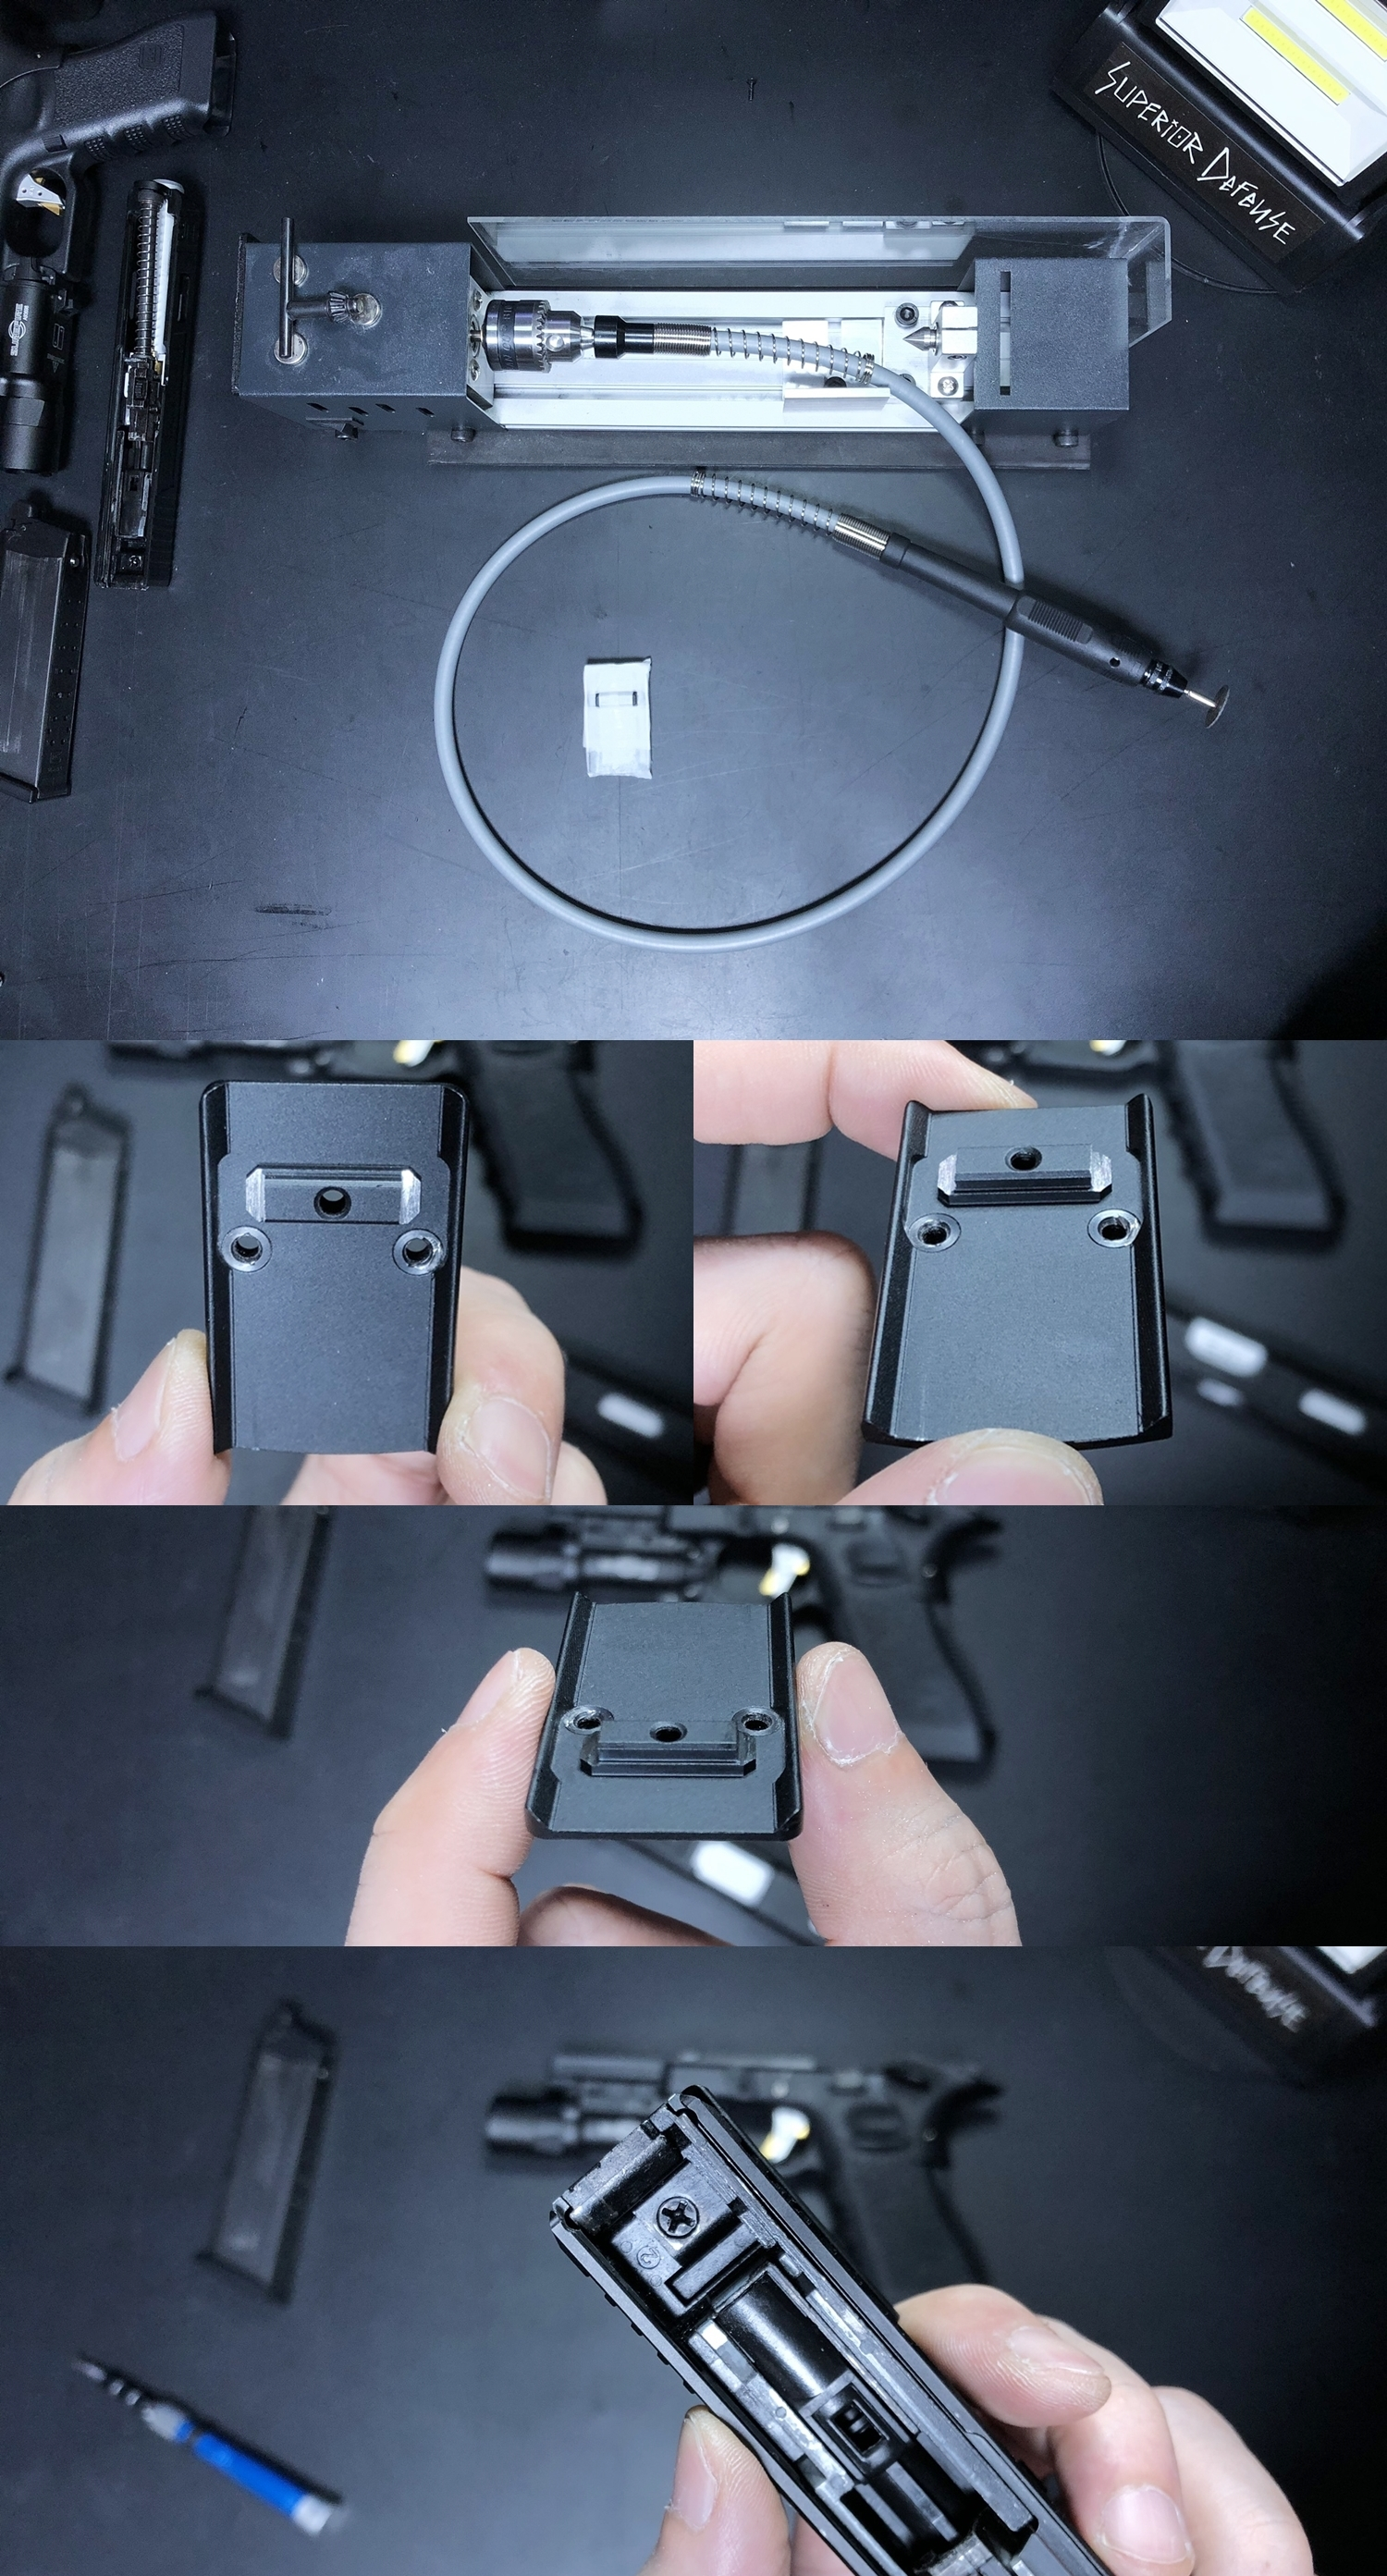 8 HolyWarrior製 RMR Trijicon Type ドットサイト GET!! 噂のHW製 最新 超軽量 複合材質 樹脂 タイプを購入したけど速攻で仲間に奪われました(笑)!! Glock G17 GBB カスタム!! 購入 開封 取付 加工 レビュー!!